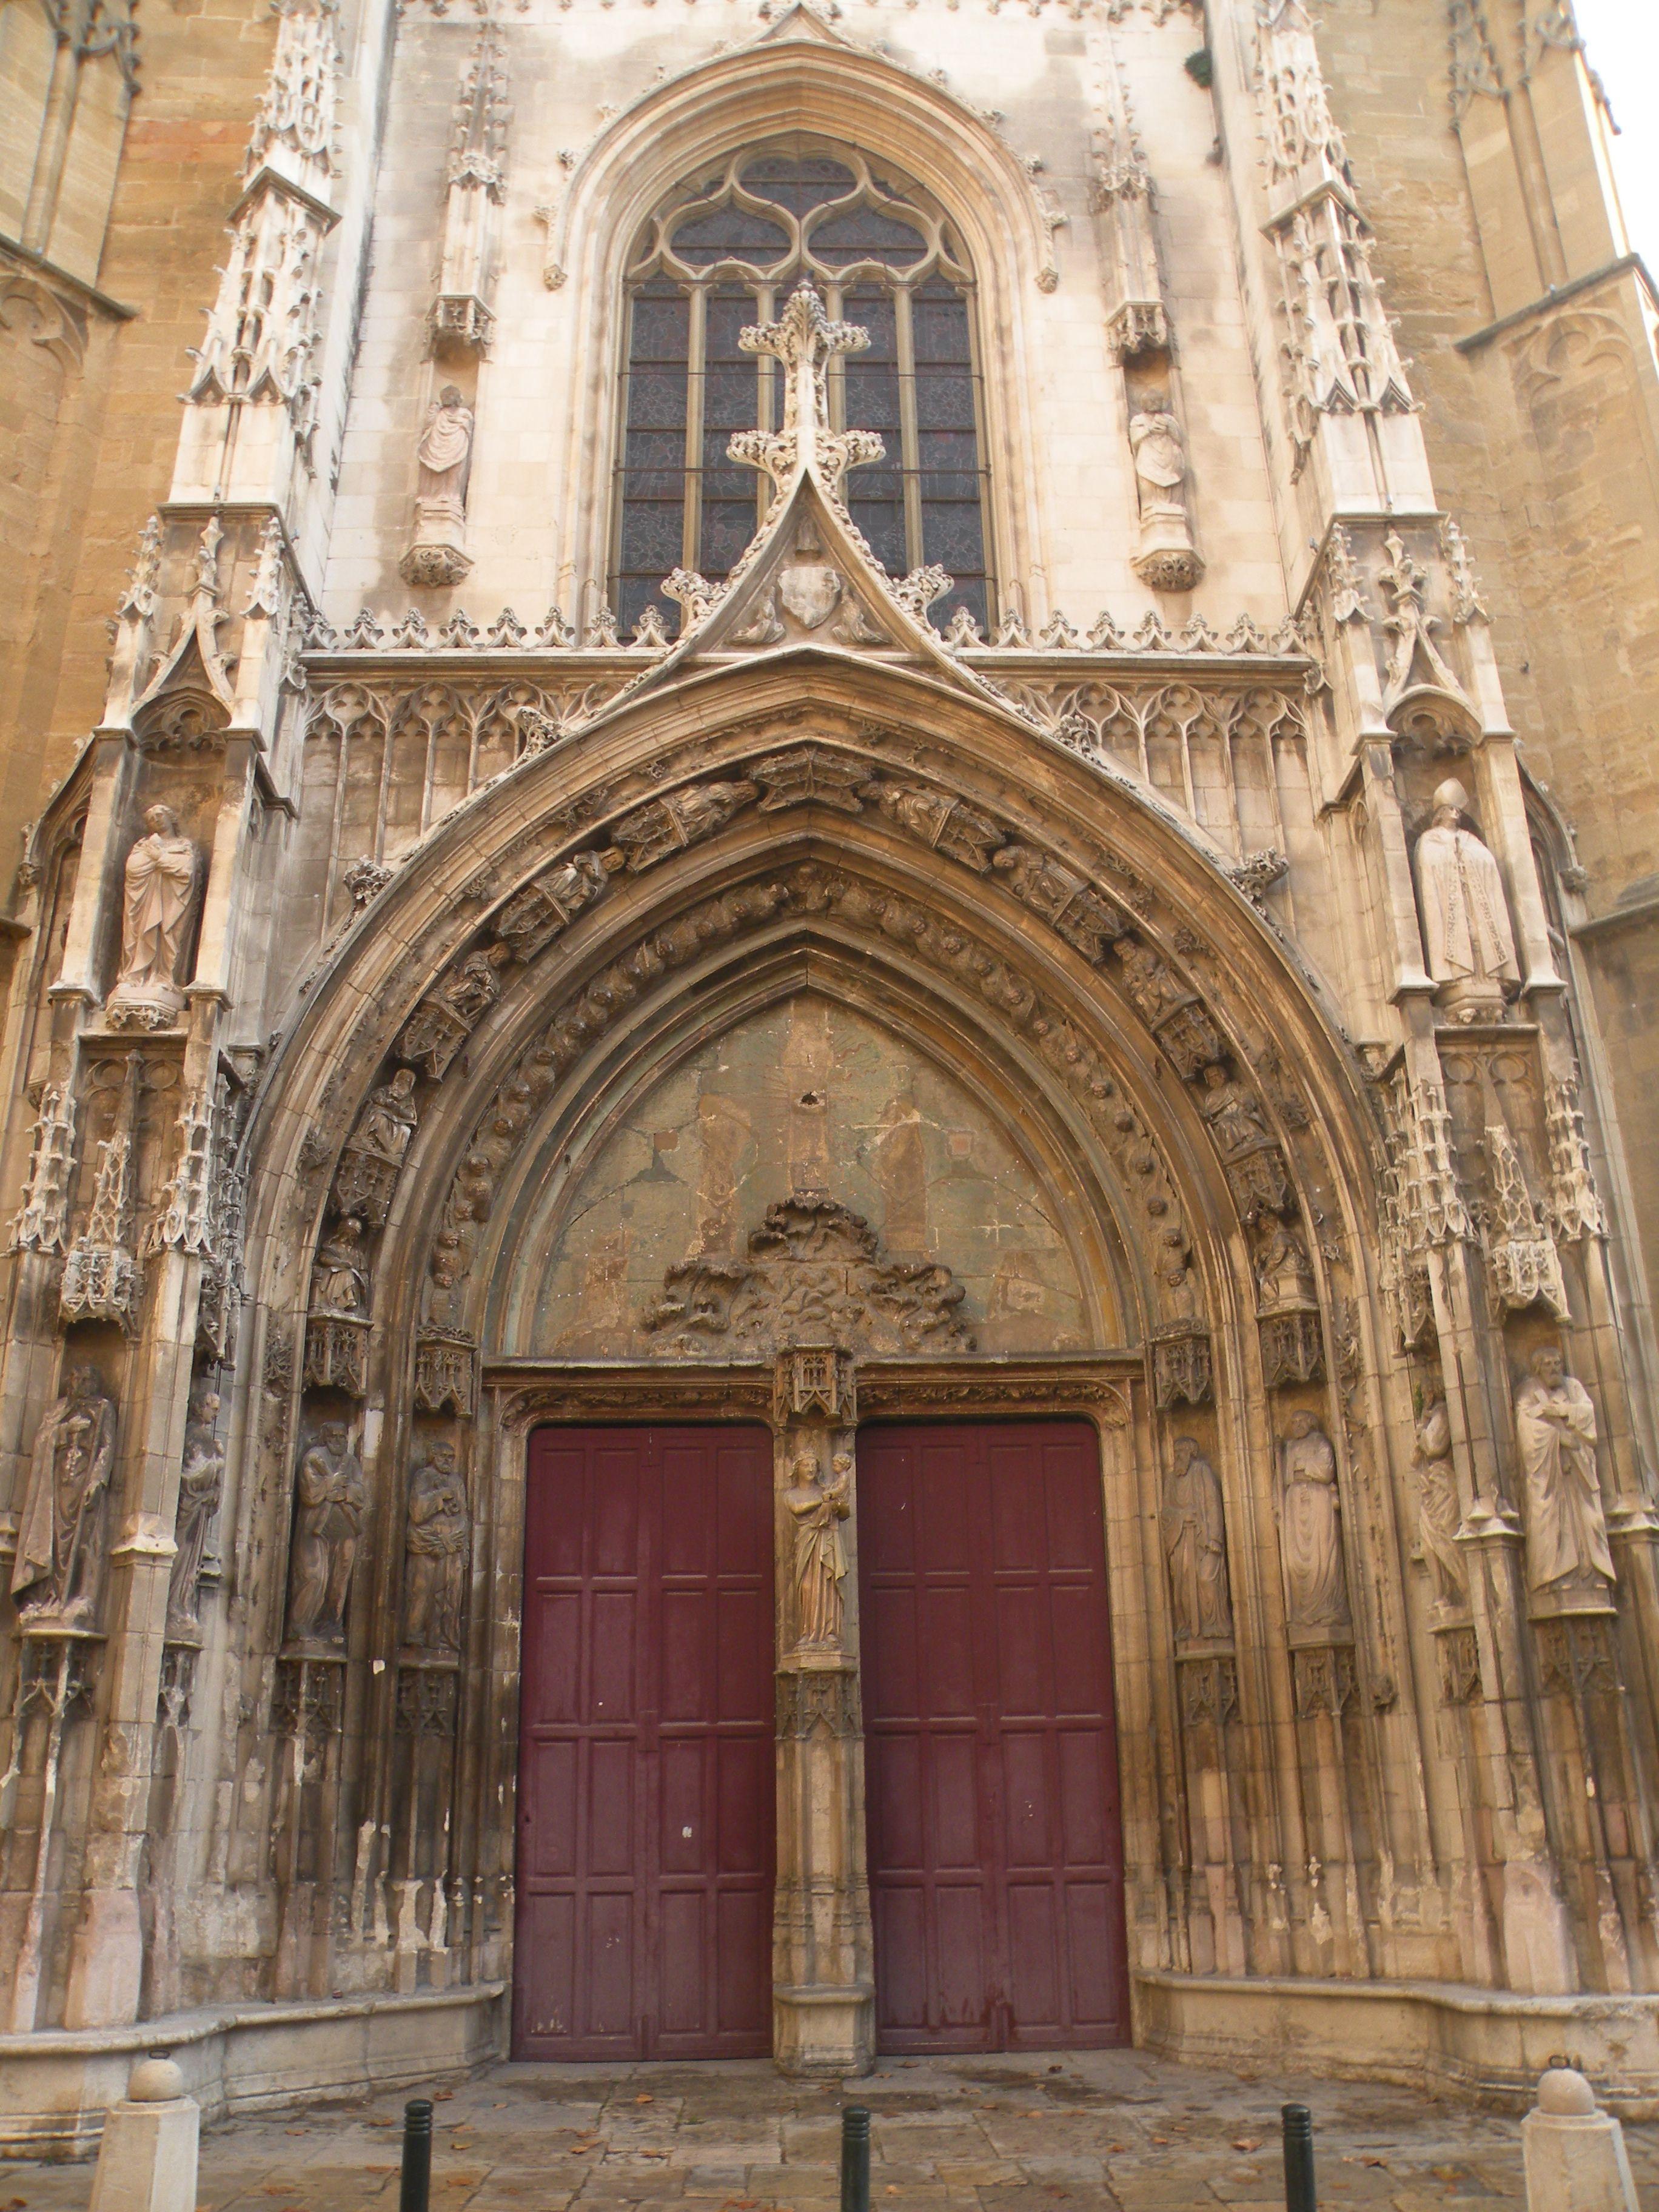 Construction Aix En Provence l'eglise aix-en-provence   french doors, barcelona cathedral